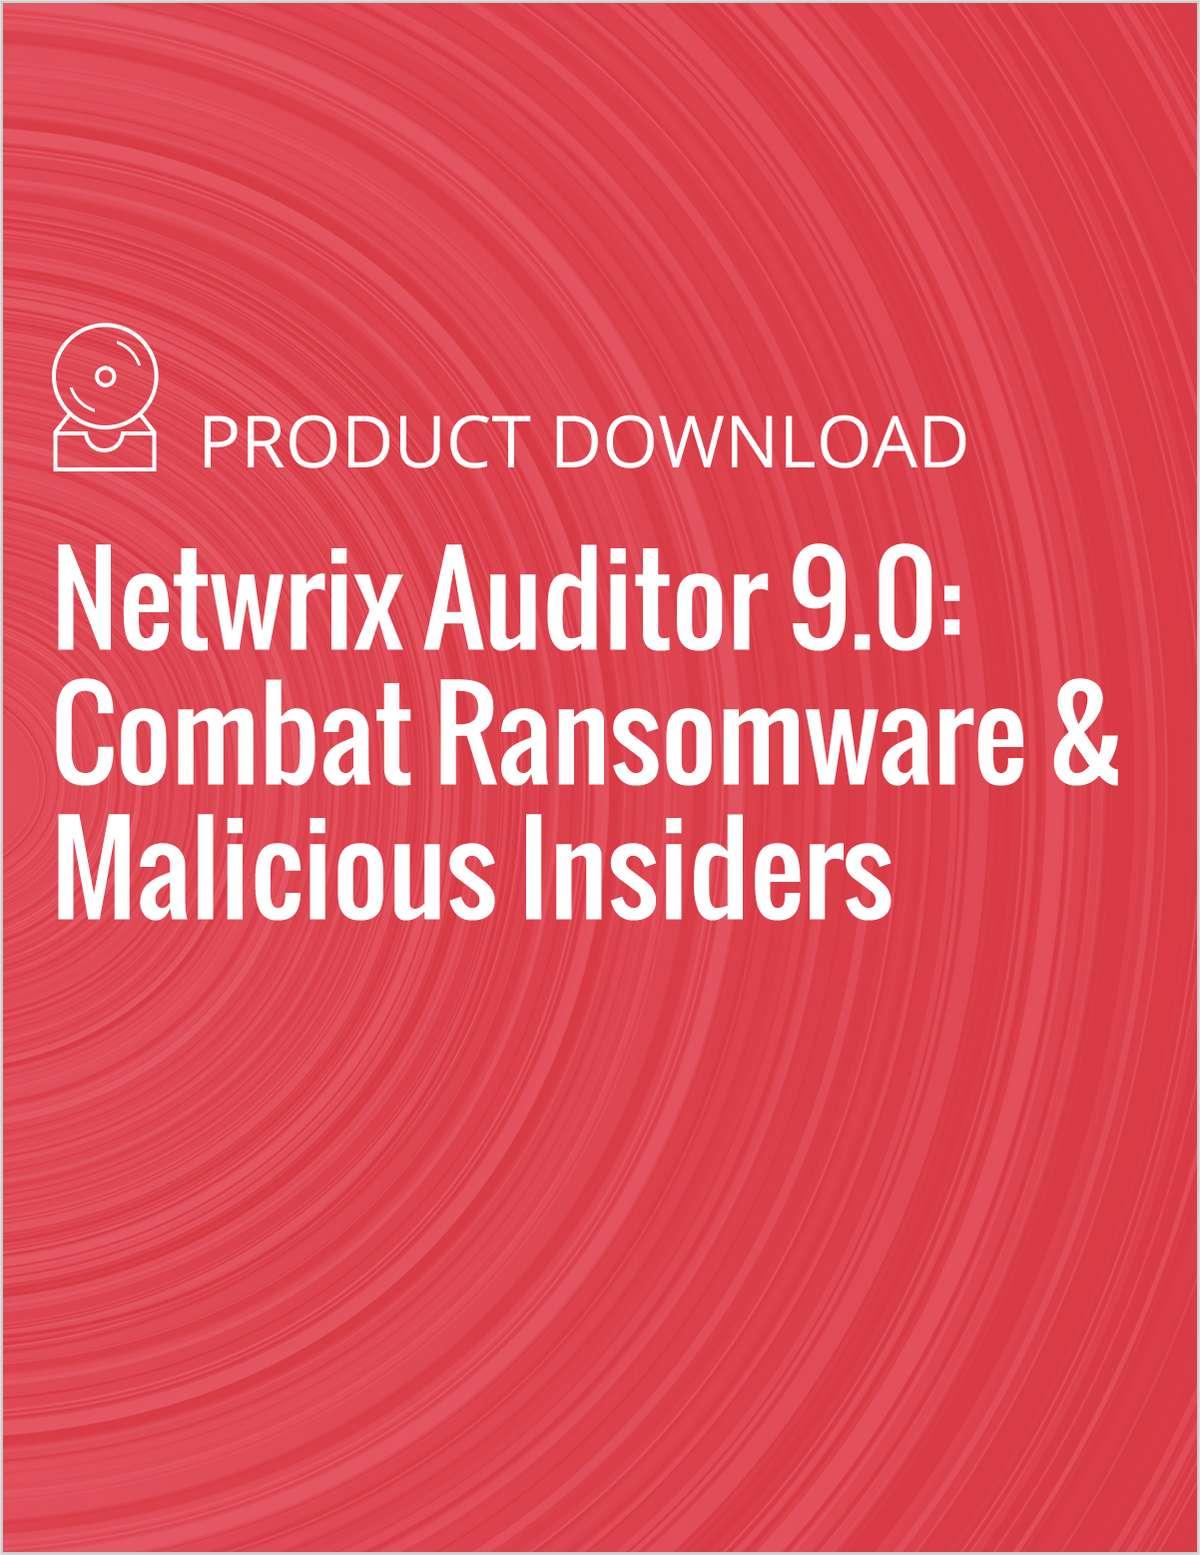 Netwrix Auditor 9.0: Combat Ransomware & Malicious Insiders